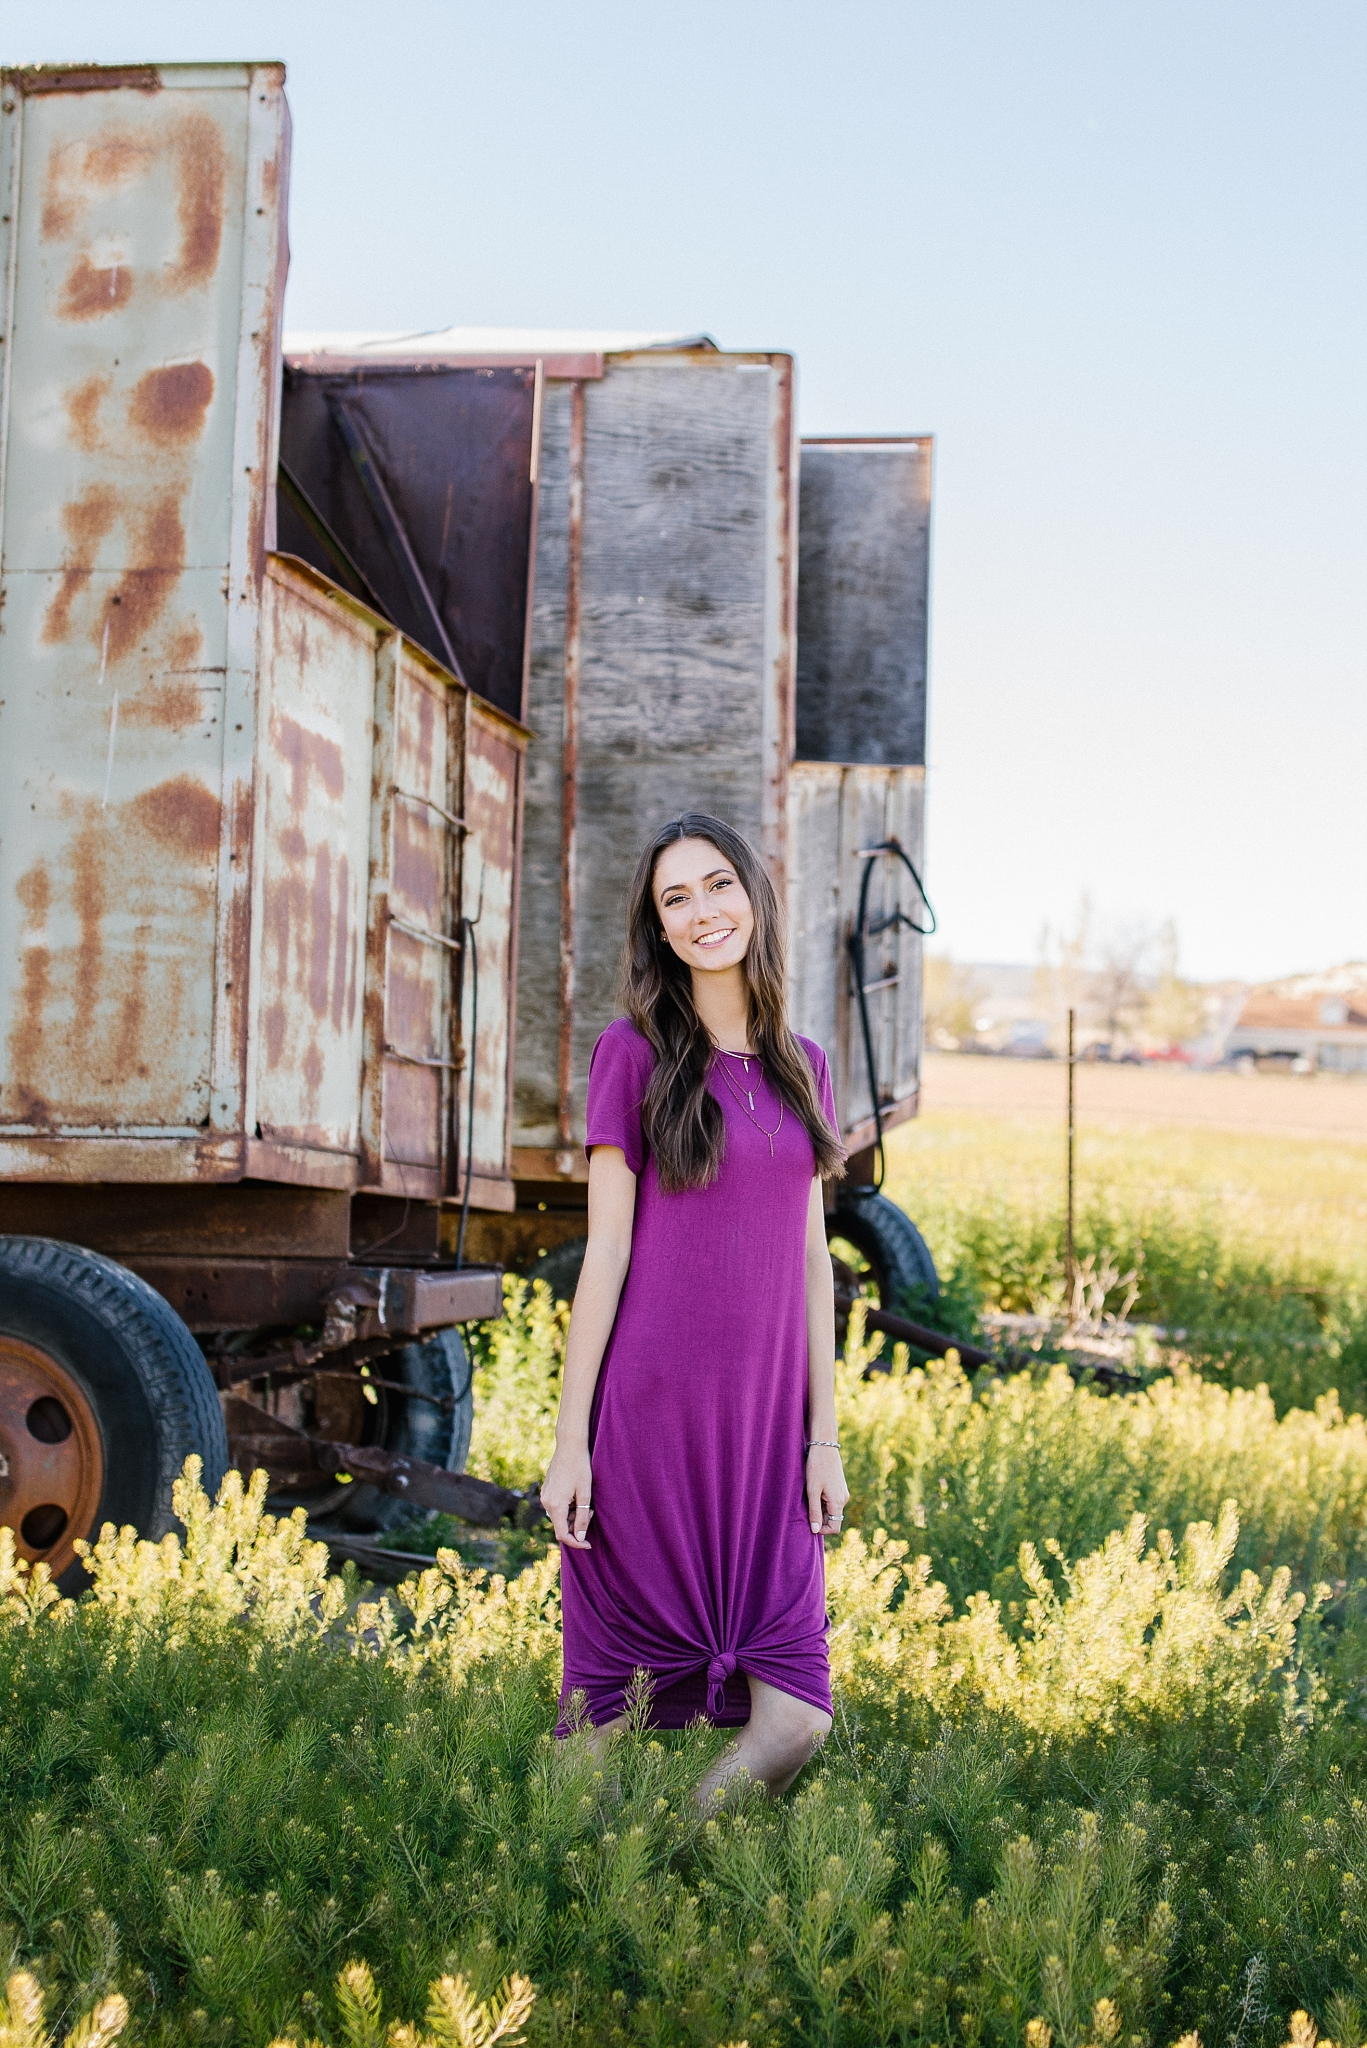 Audrey-45_Lizzie-B-Imagery-Utah-Family-Photographer-Central-Utah-Senior-Photography.jpg